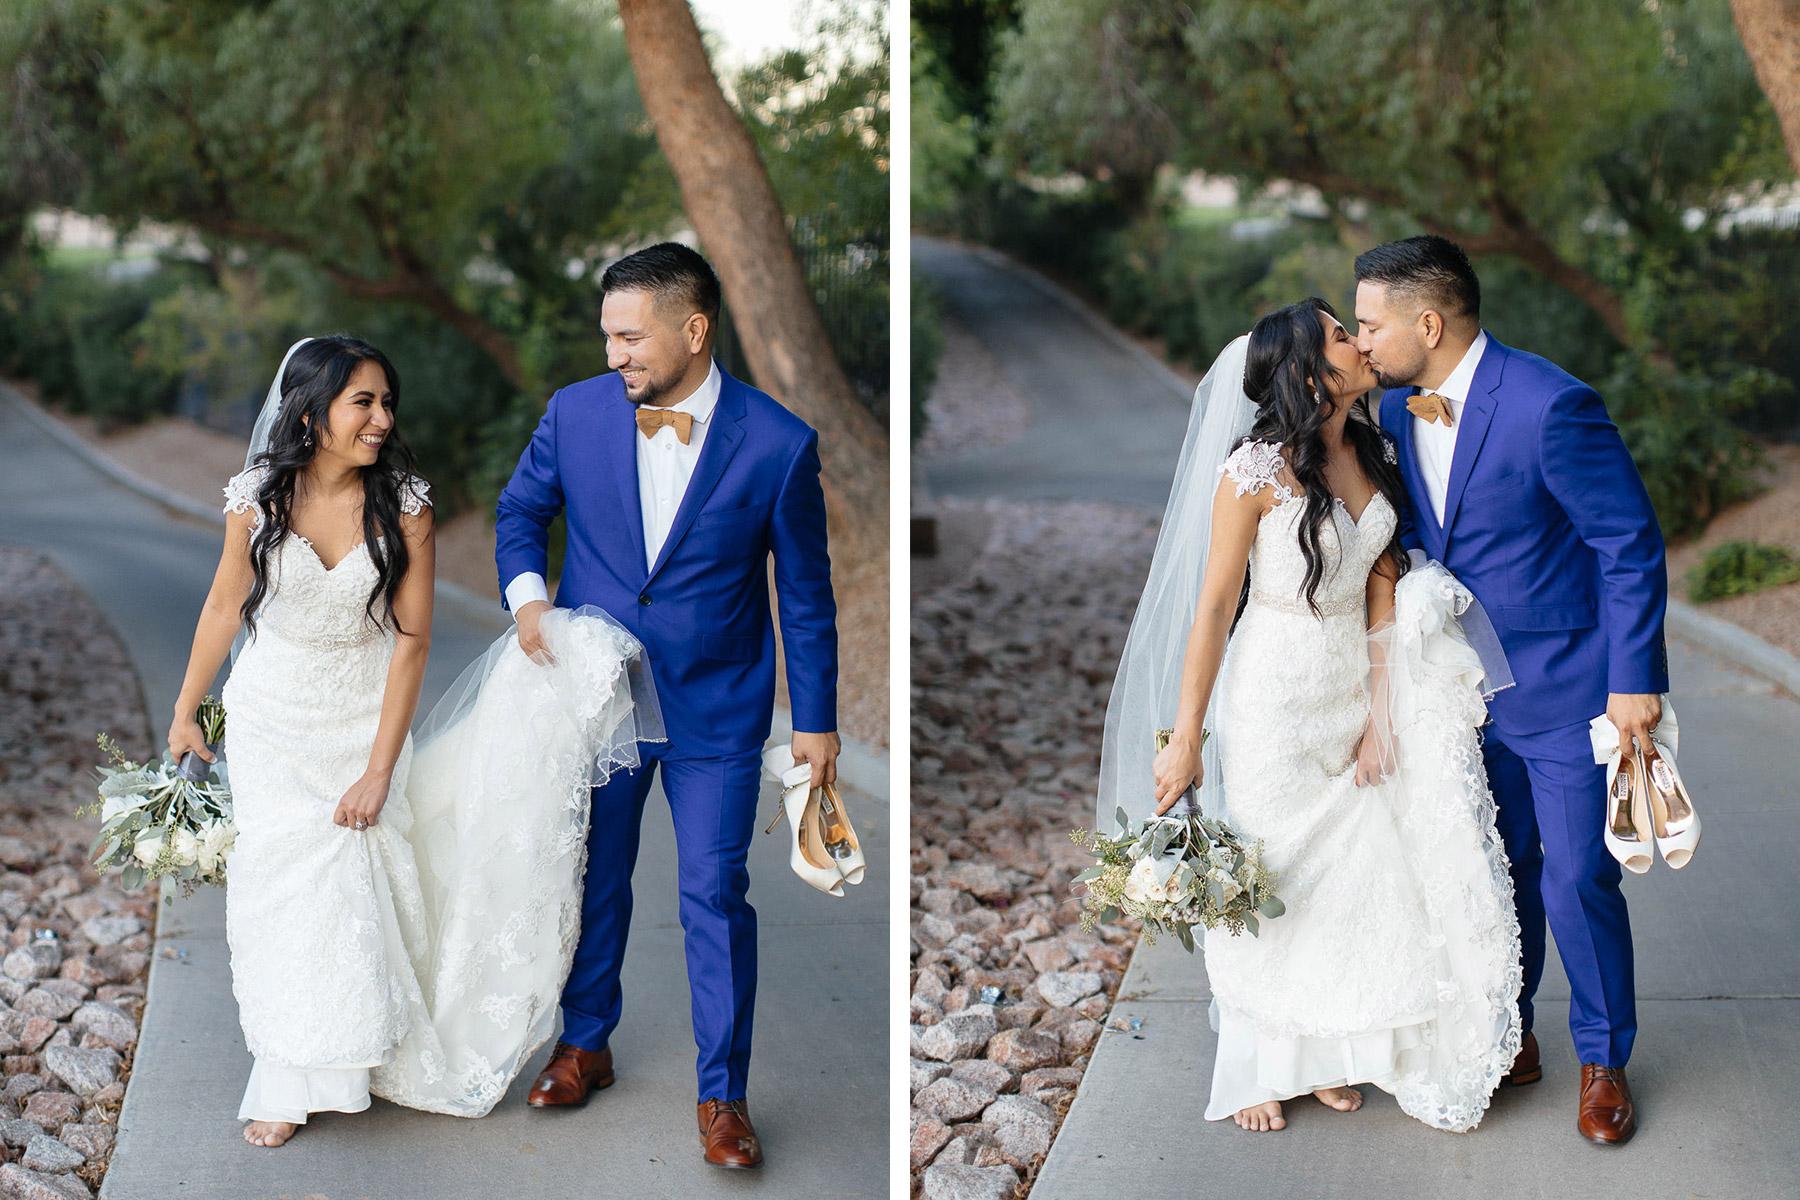 161029-Luxium-Weddings-Arizona-Jeff-Griselda-First-Look-Val-Vista-Lakes-Gilber-071a.jpg